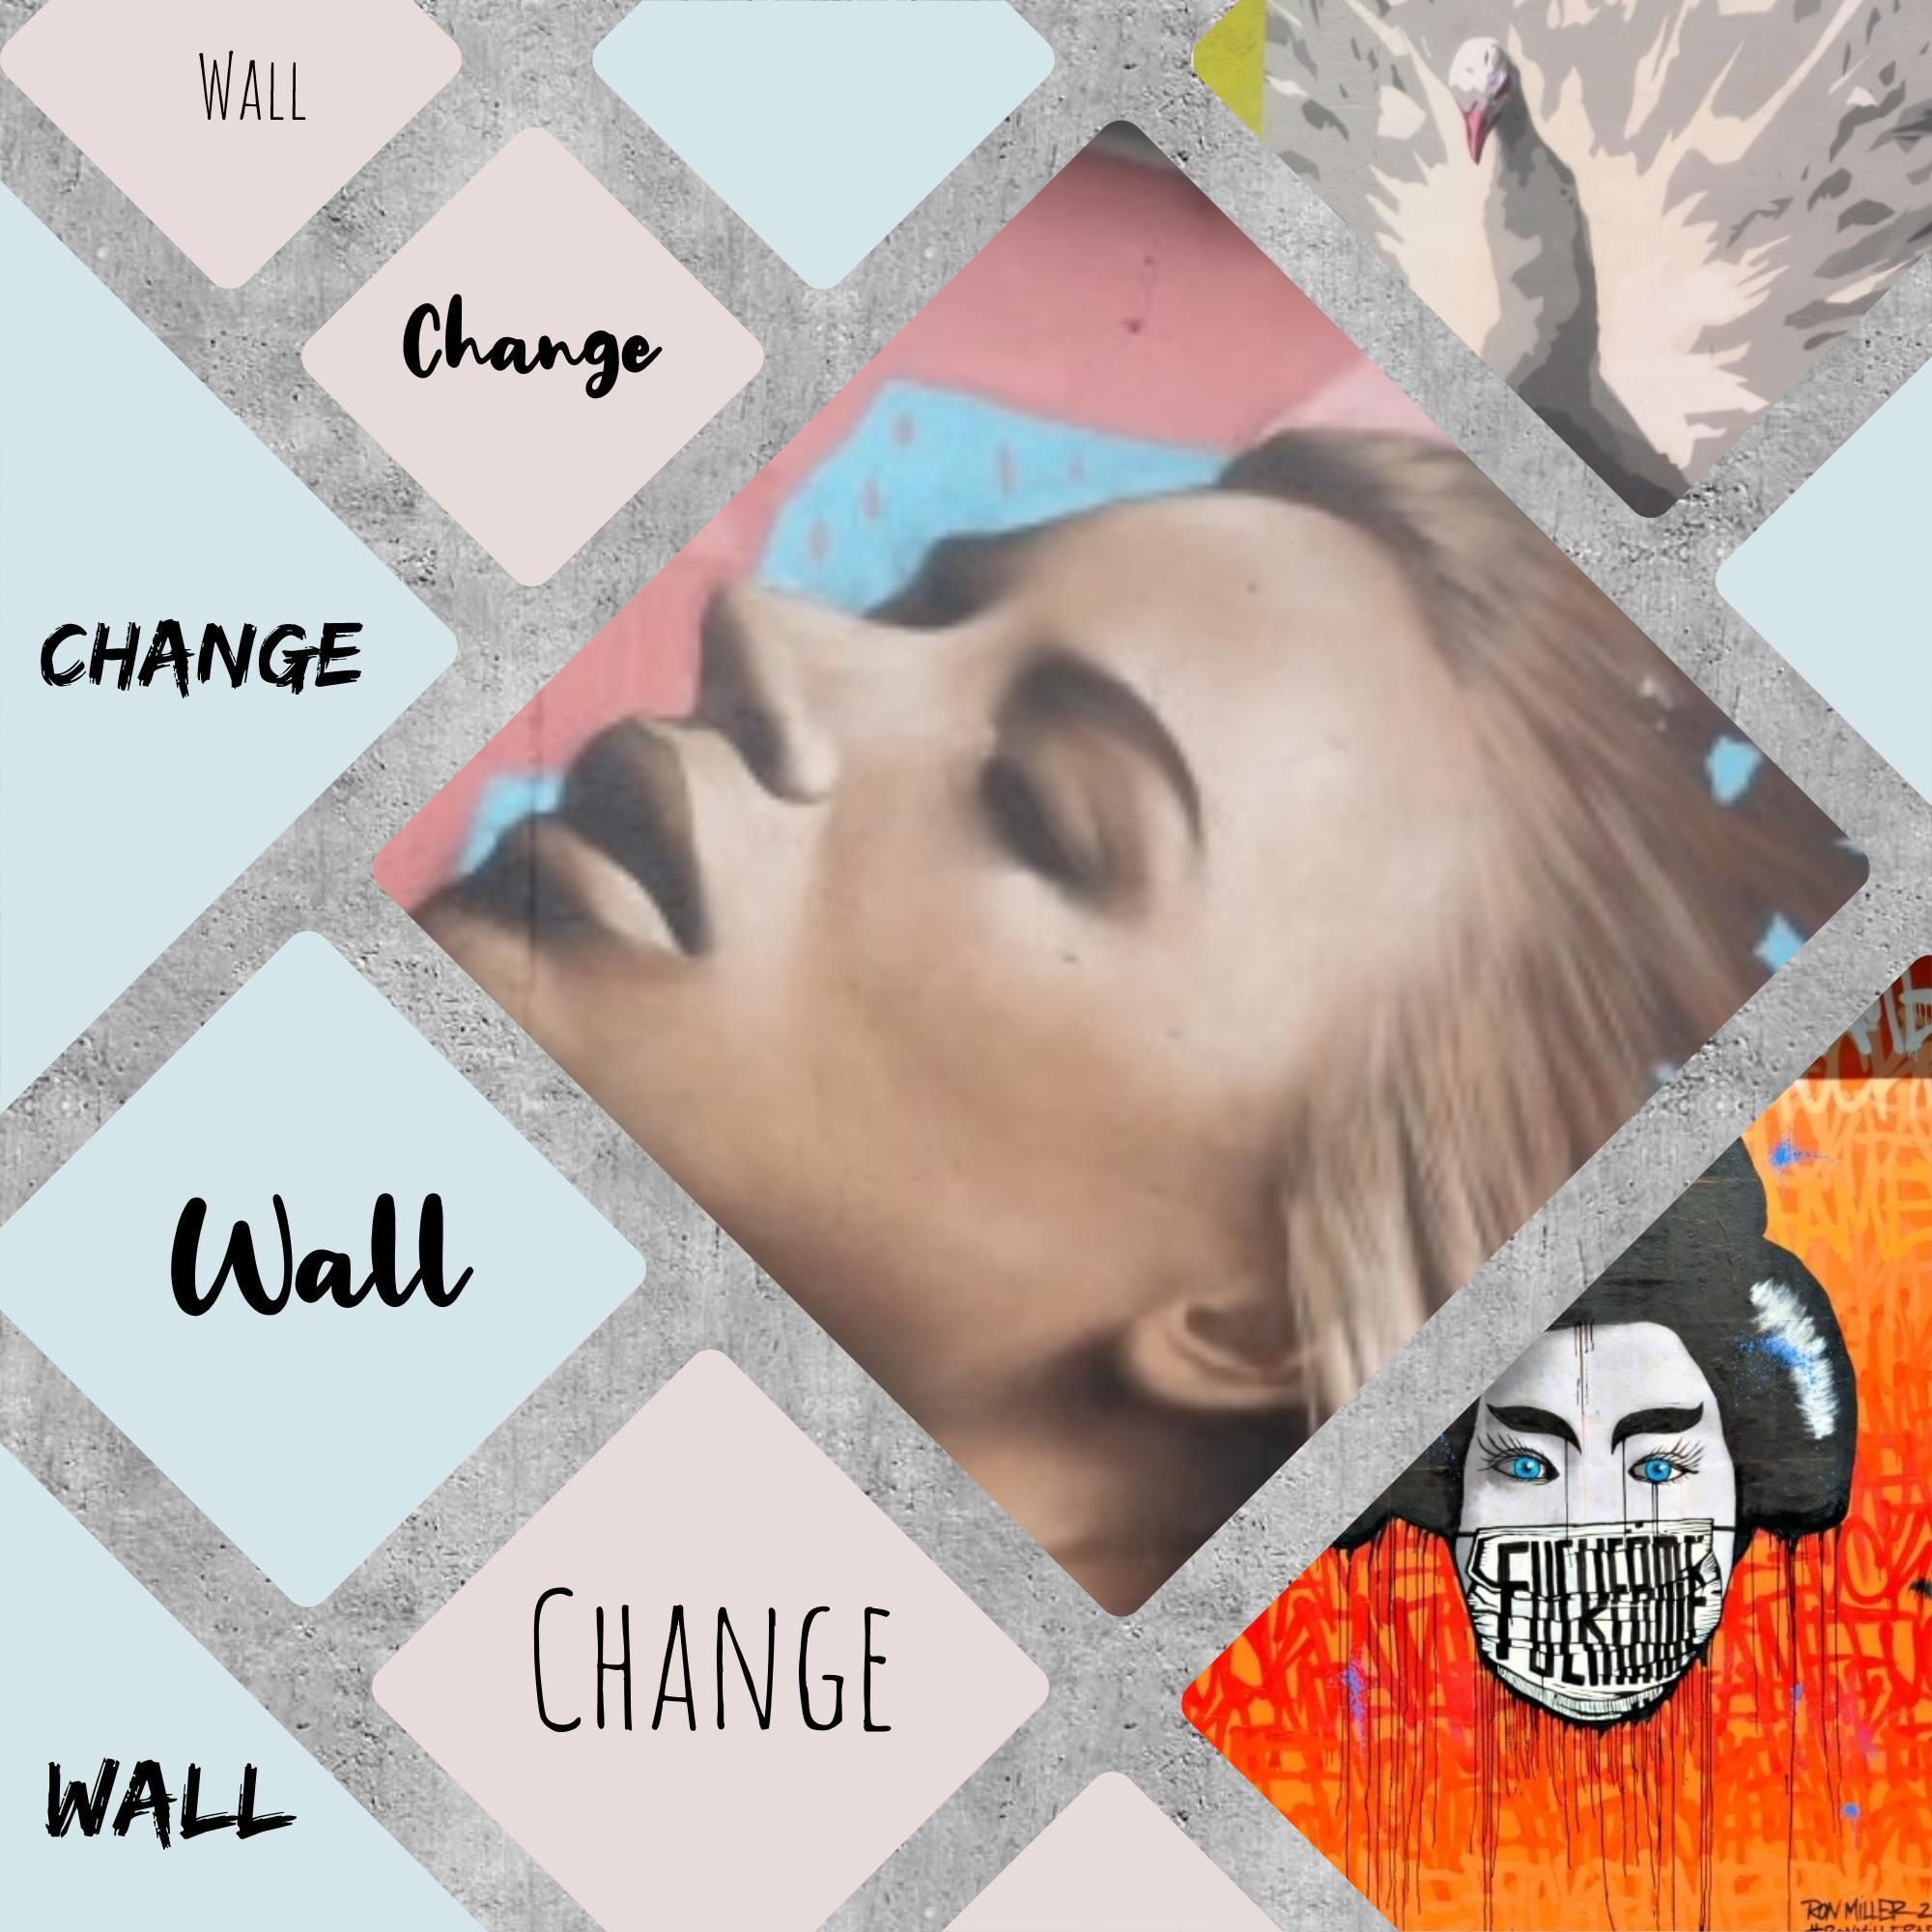 Changing Walls Mauerfall Berliner Mauer be kitschig blog oktober 3 0ctober